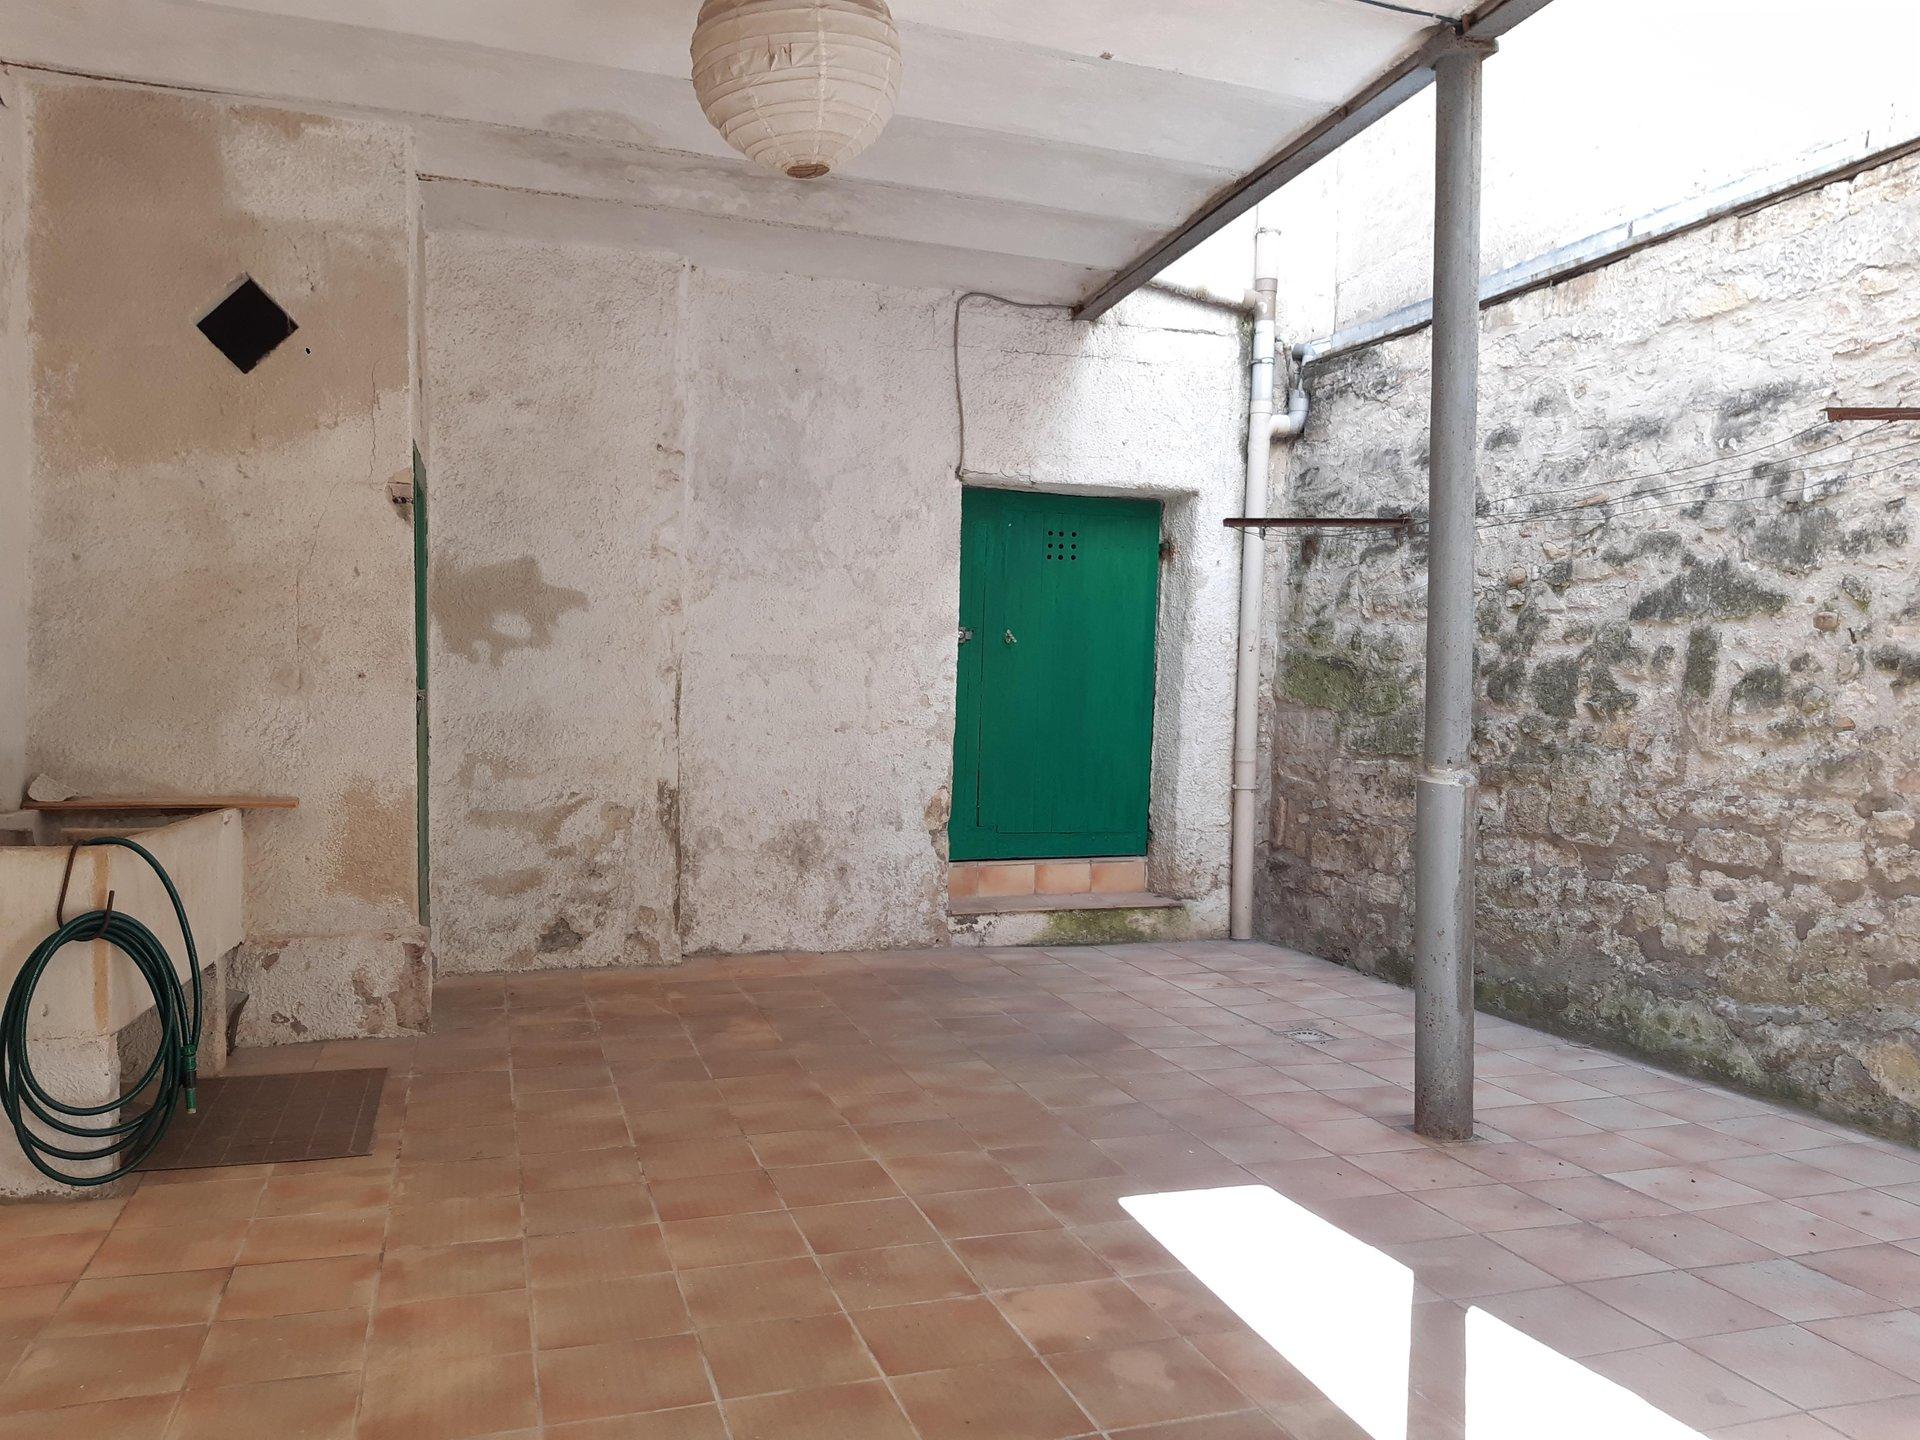 Location Appartement TARASCON surface habitable de 80 m²